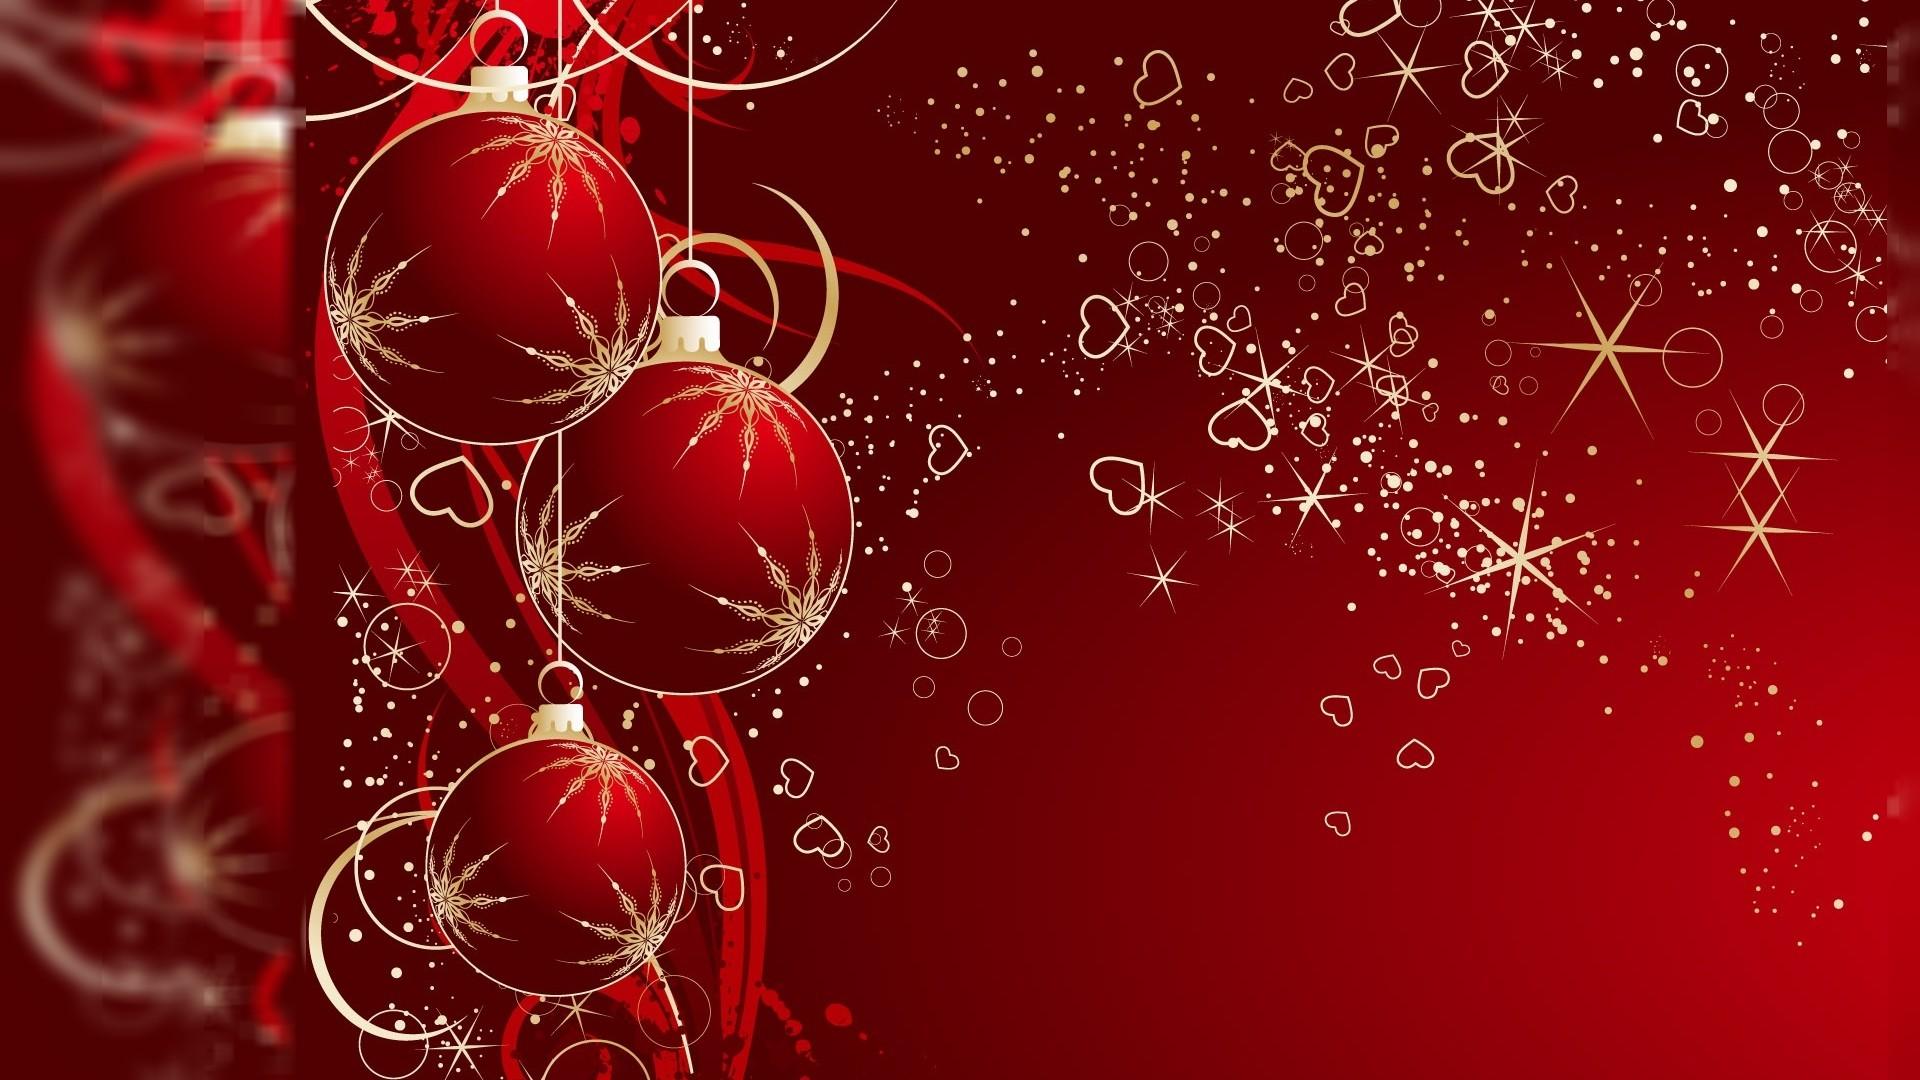 christmas-desktop-backgrounds-13.jpg